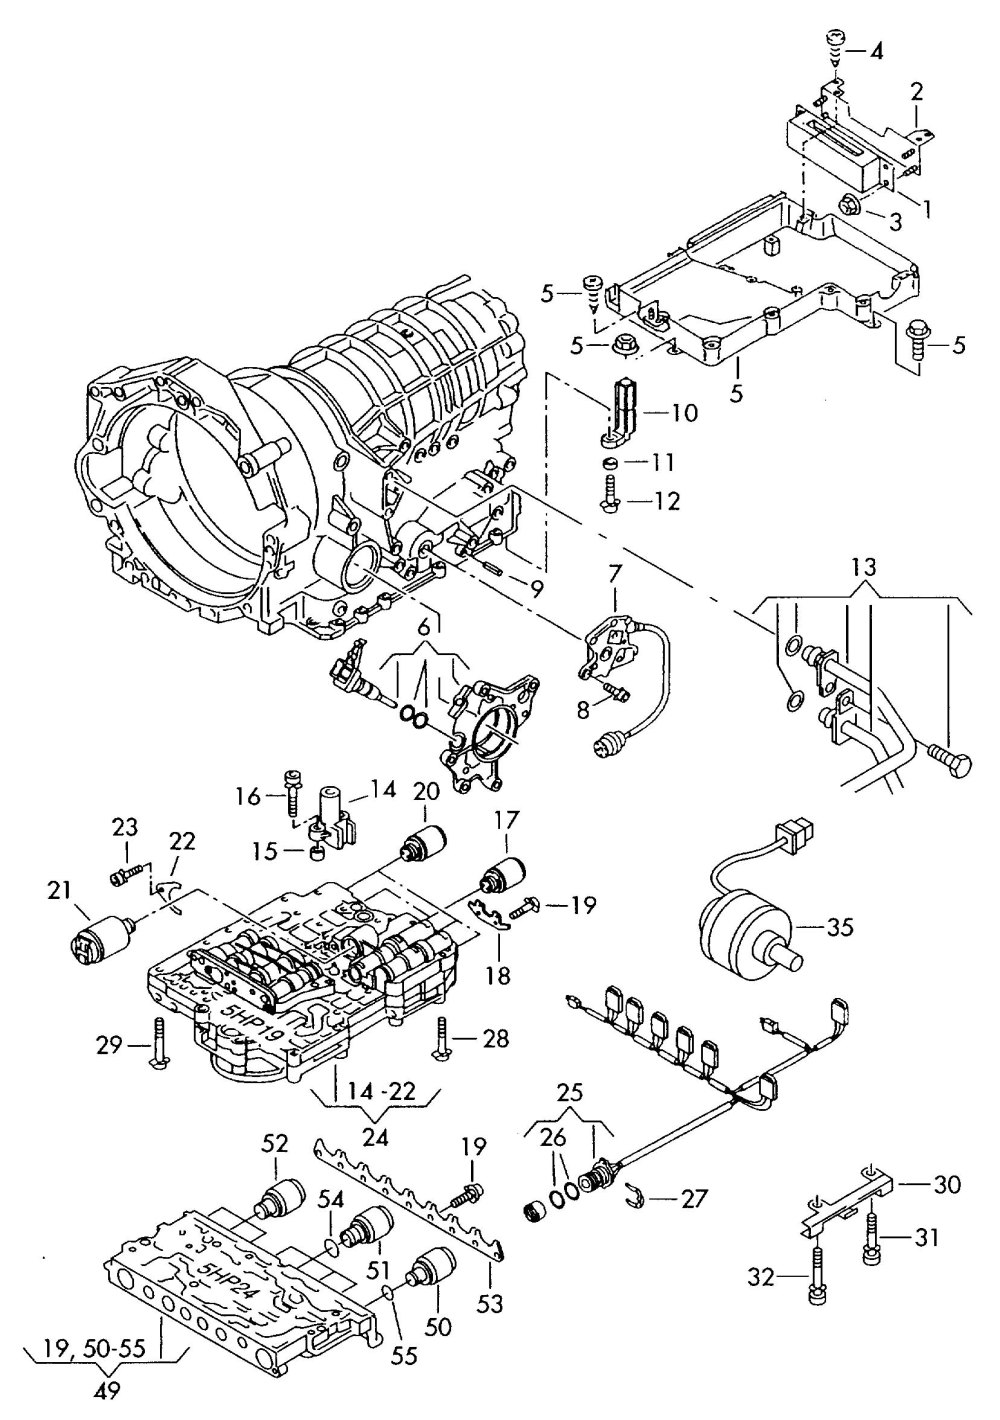 medium resolution of 1998 volkswagen jetta engine diagram bull wiring diagram for free 1998 vw jetta engine diagram